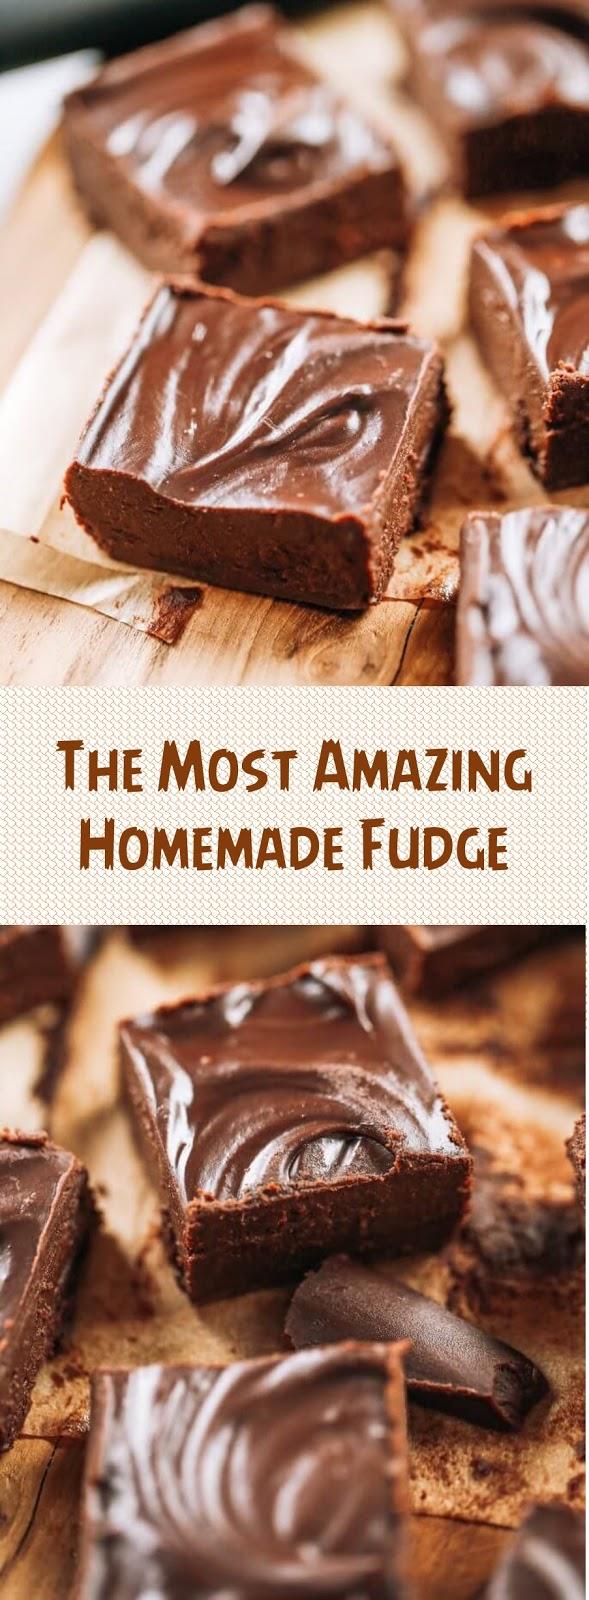 The Most Amazing Homemade Fudge